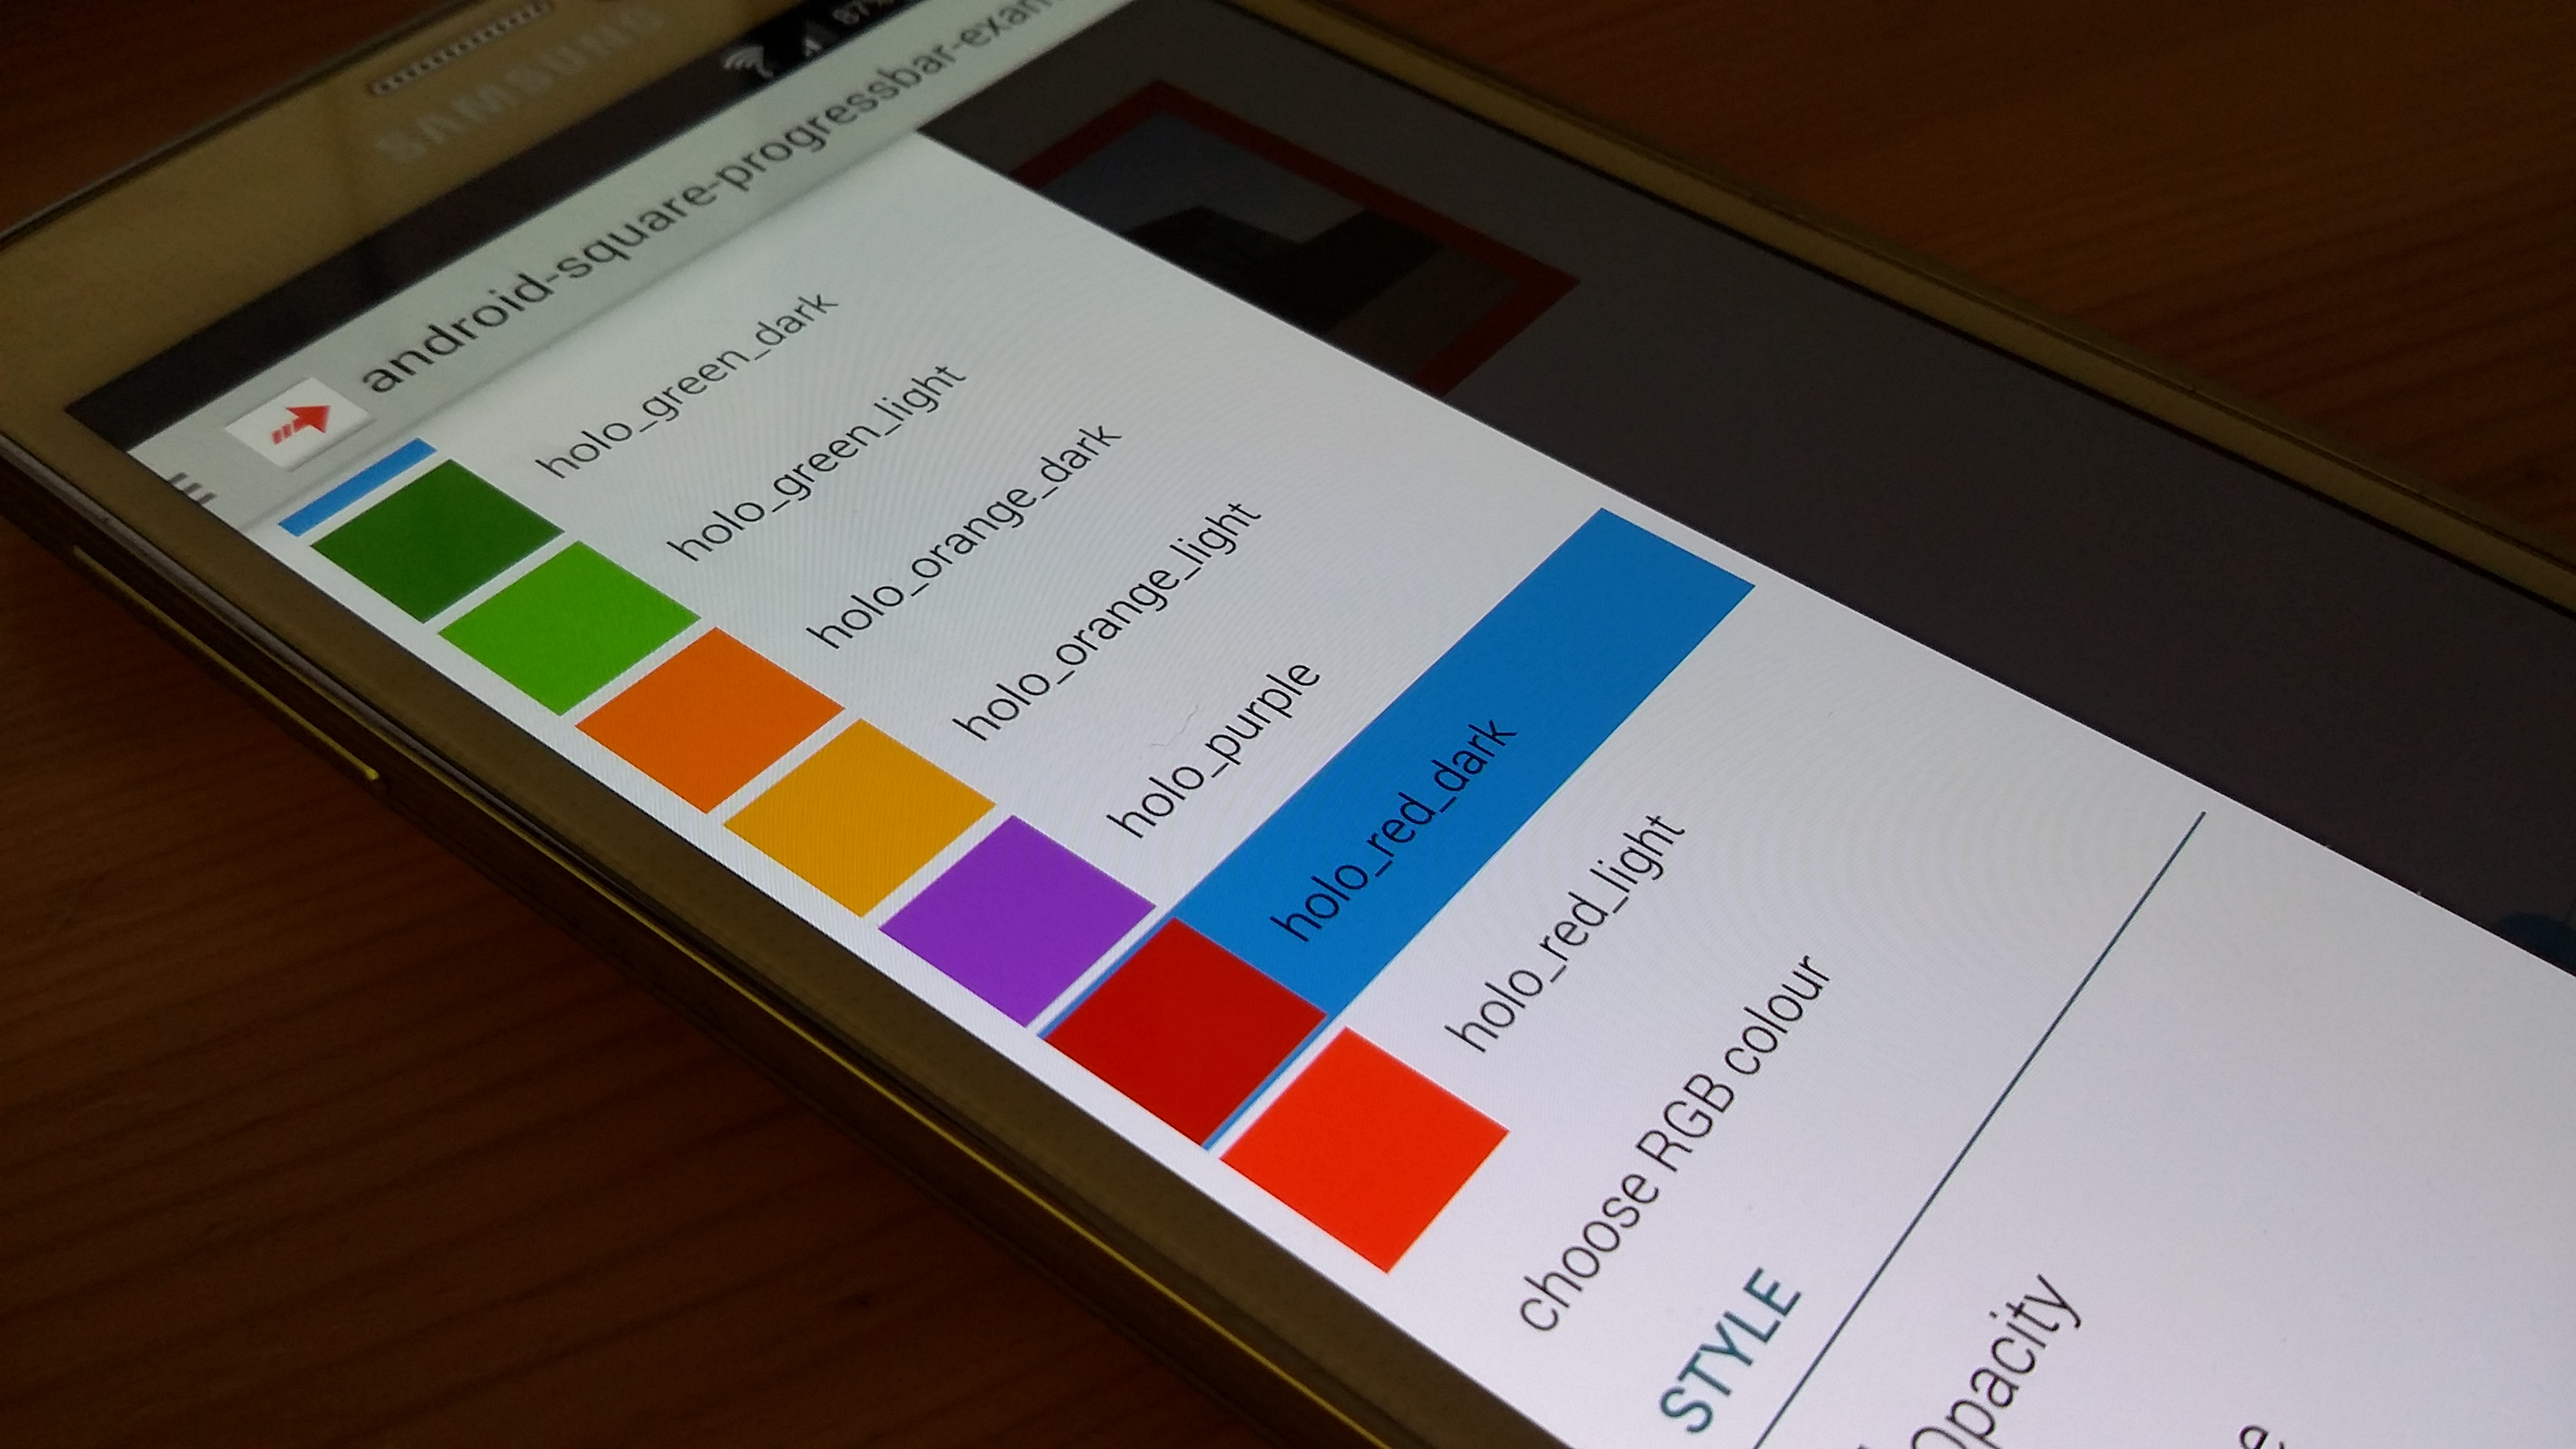 android-square-progressbar v.1.4.0